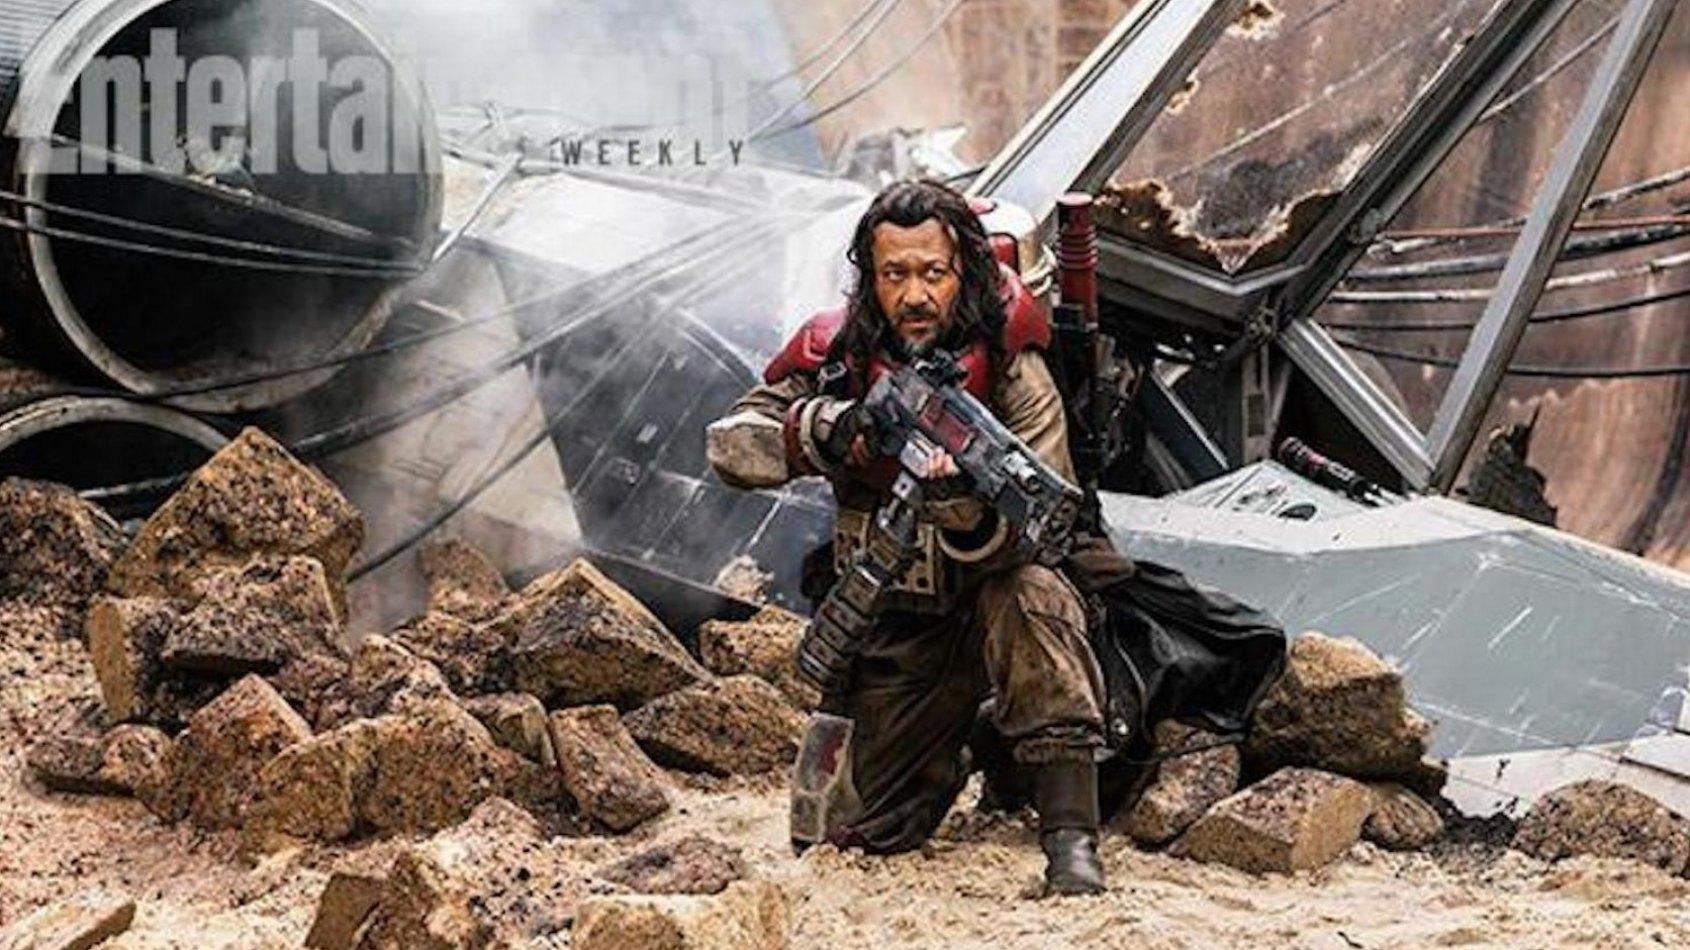 Jedi, Jedha et guerriers spirituels dans Rogue One: A Star Wars Story